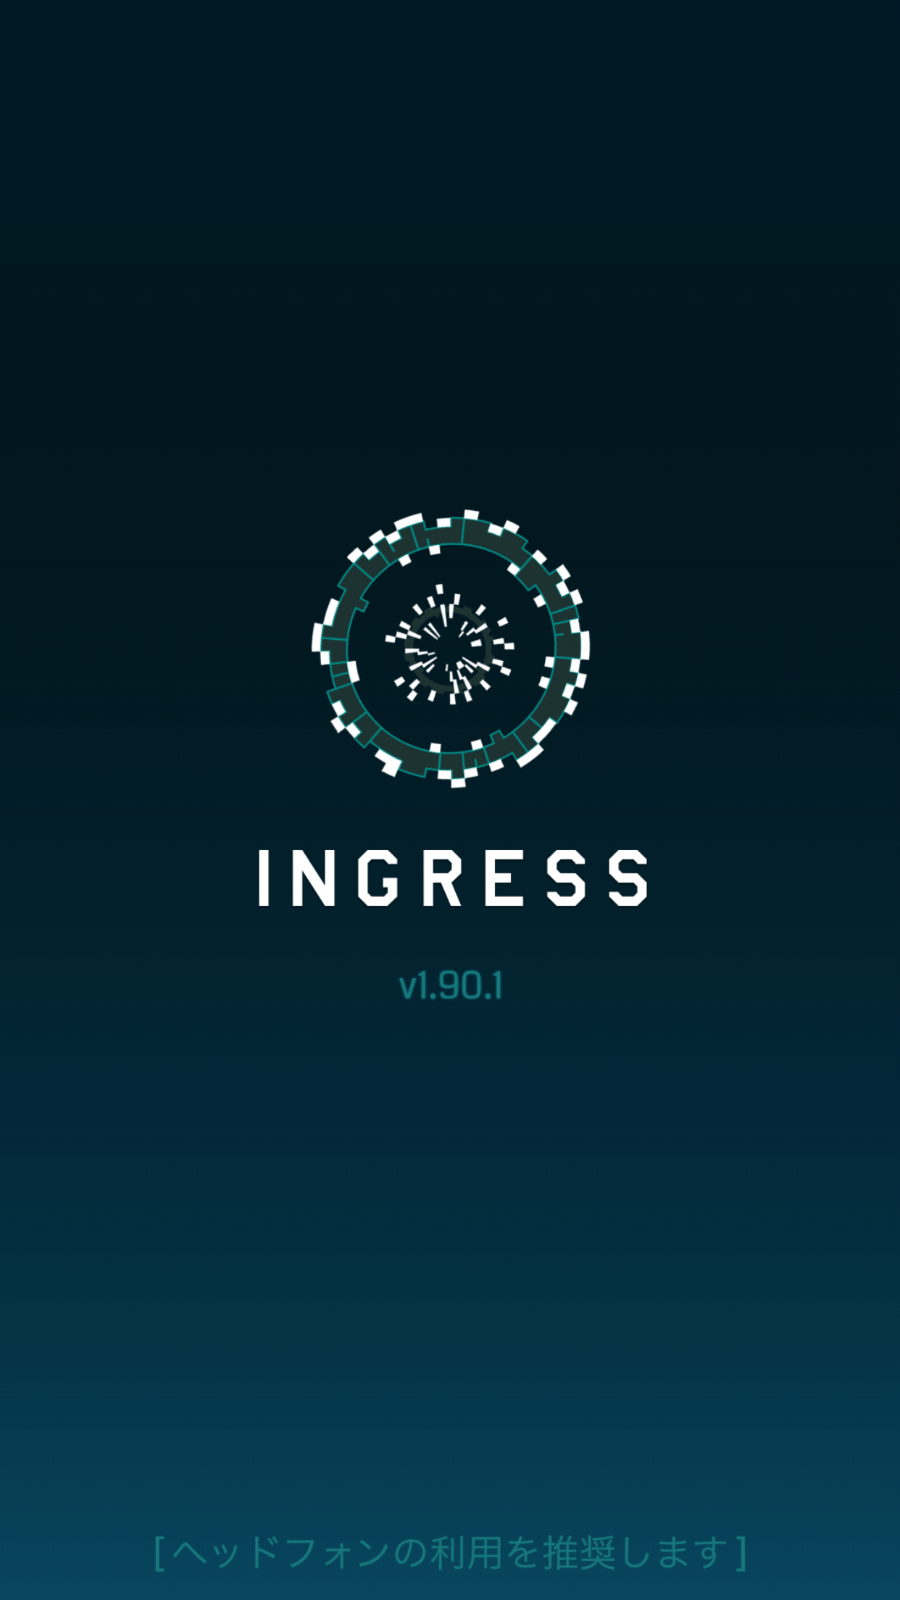 【Ingress】iOS版「Ingress 1.90.1」リリース → 「HACK NO Key(鍵なしハック)」「コマンドチャンネル(グリフハックにリクエスト送信)」機能が追加